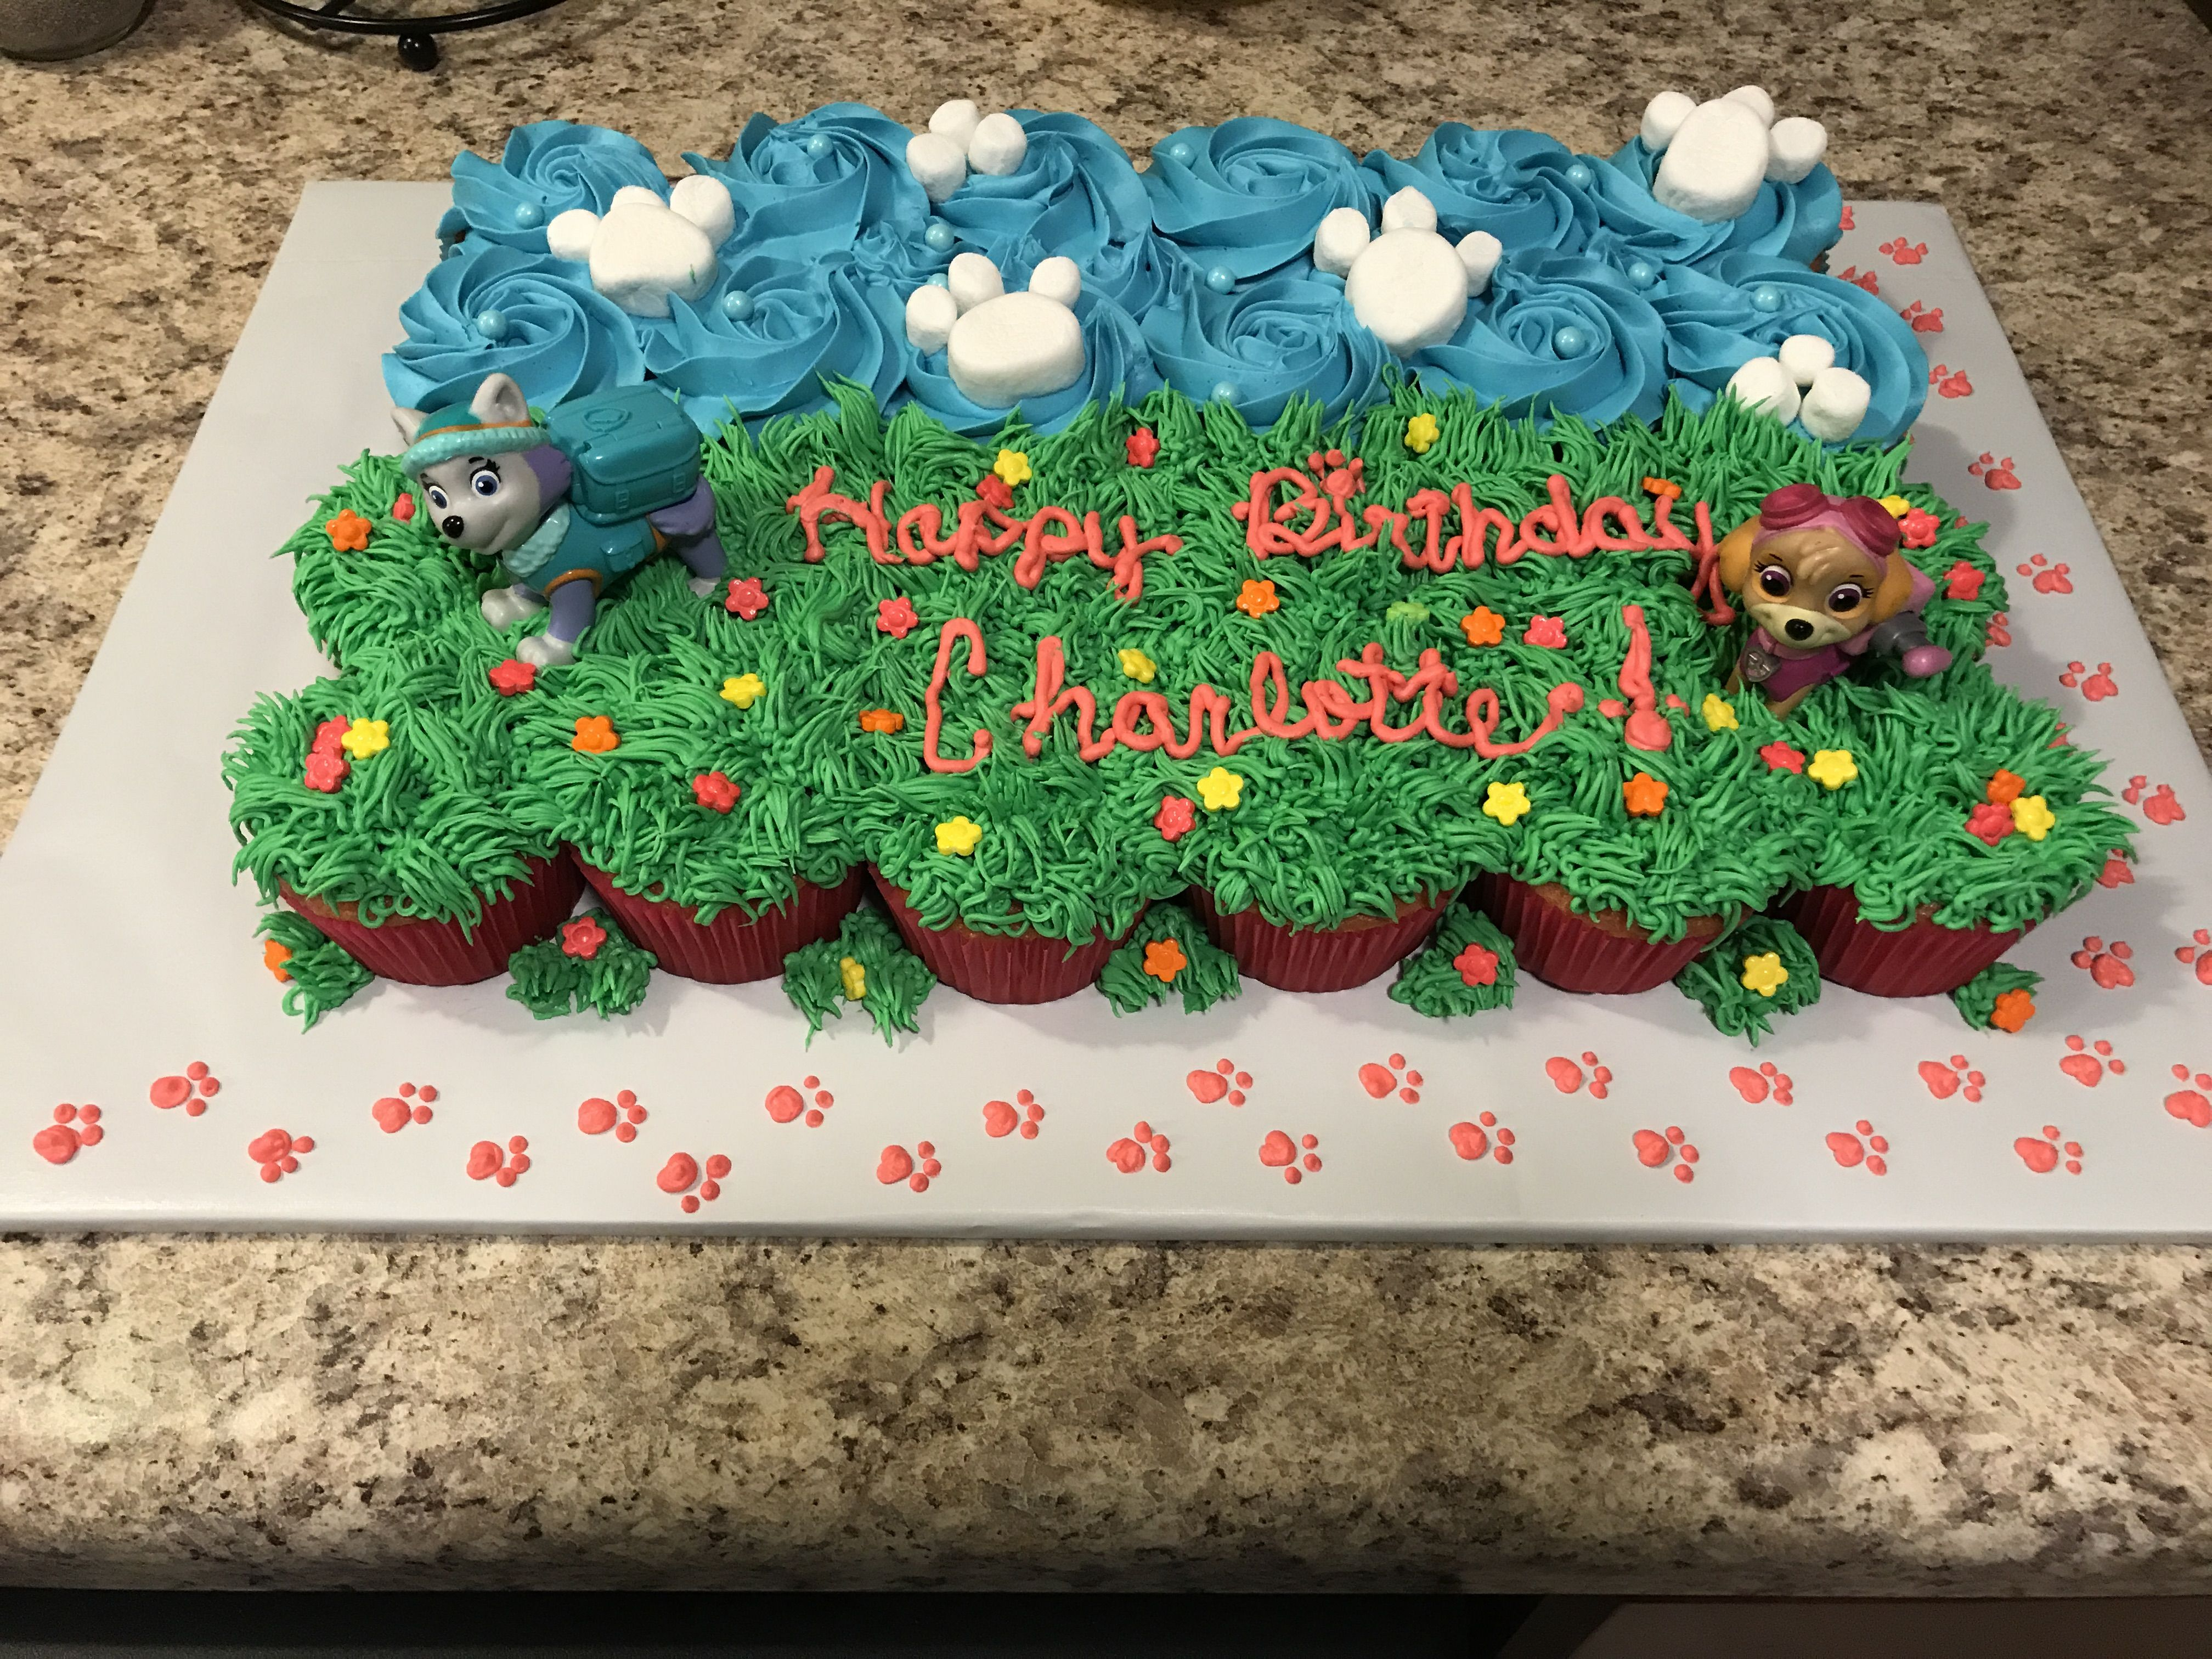 Paw Patrol Cupcake Cake With Images Paw Patrol Cake Diy Paw